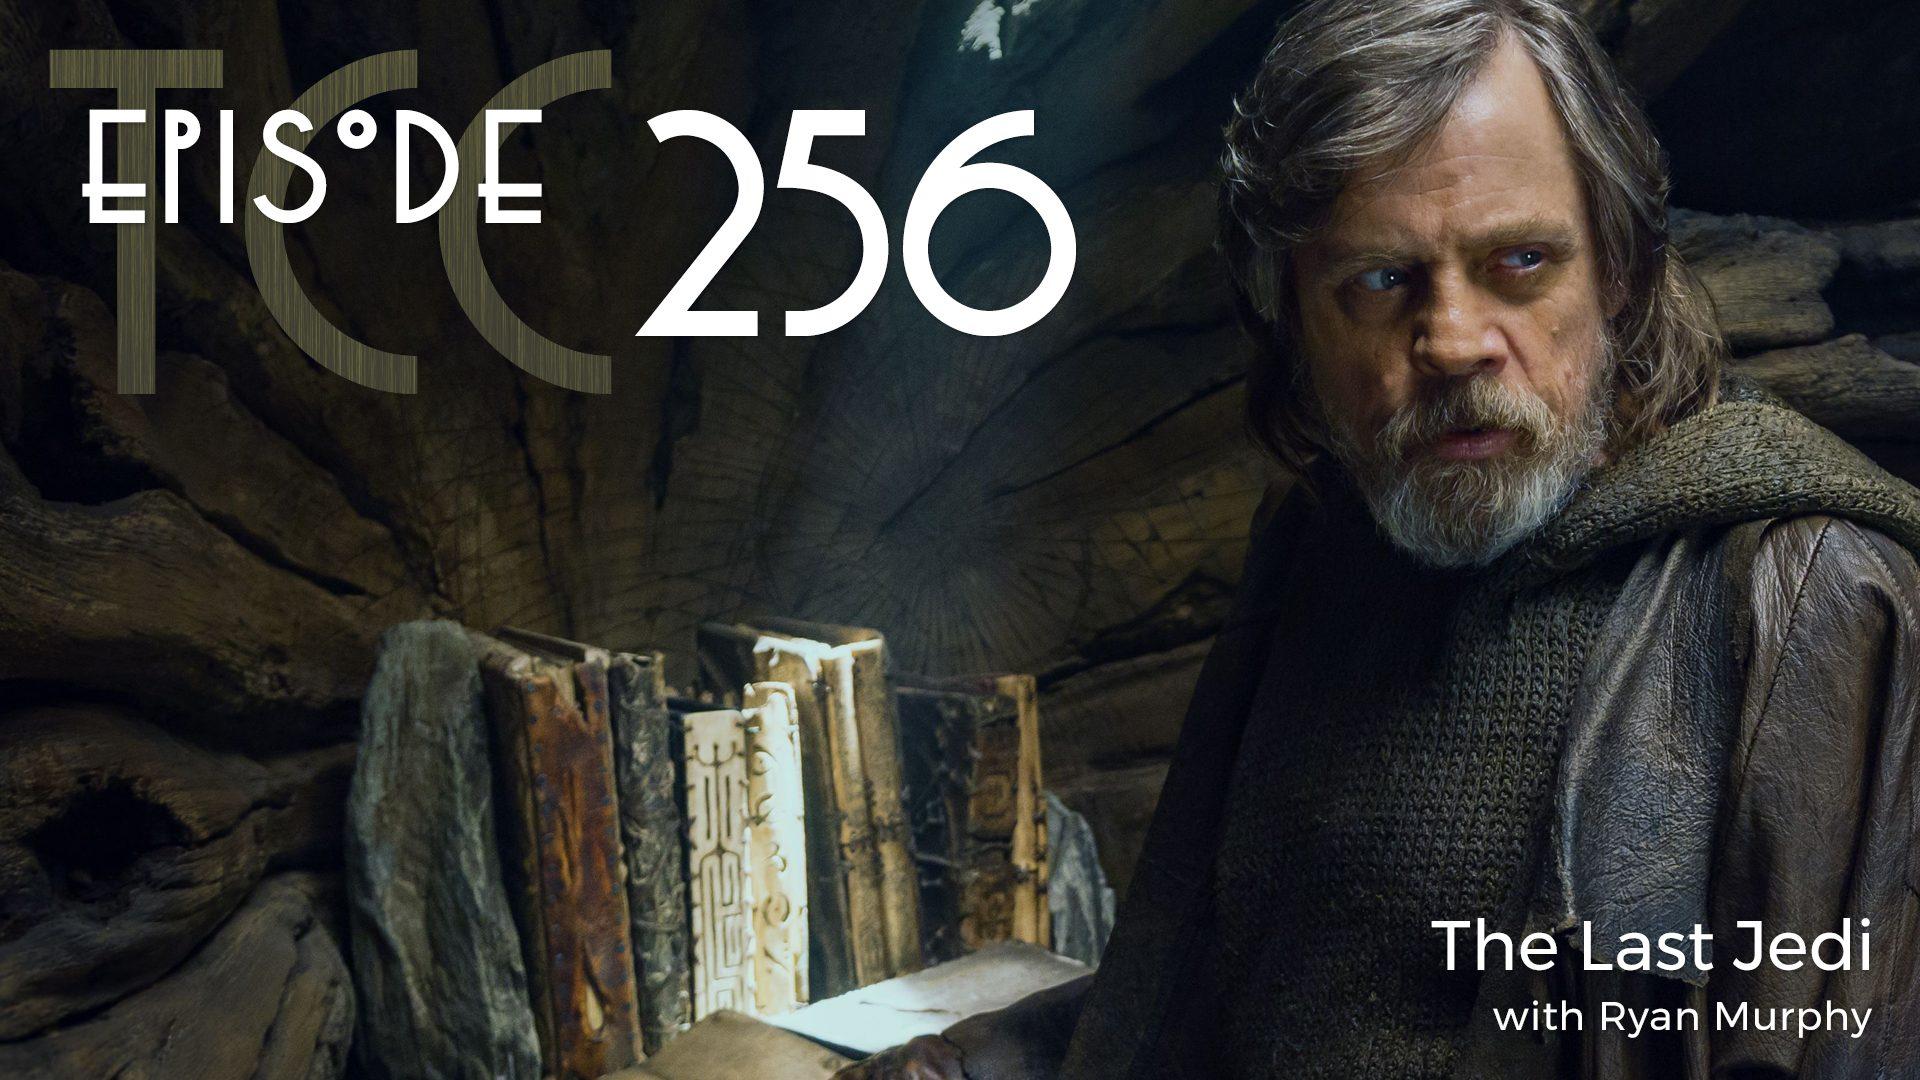 The Citadel Cafe 256: The Last Jedi